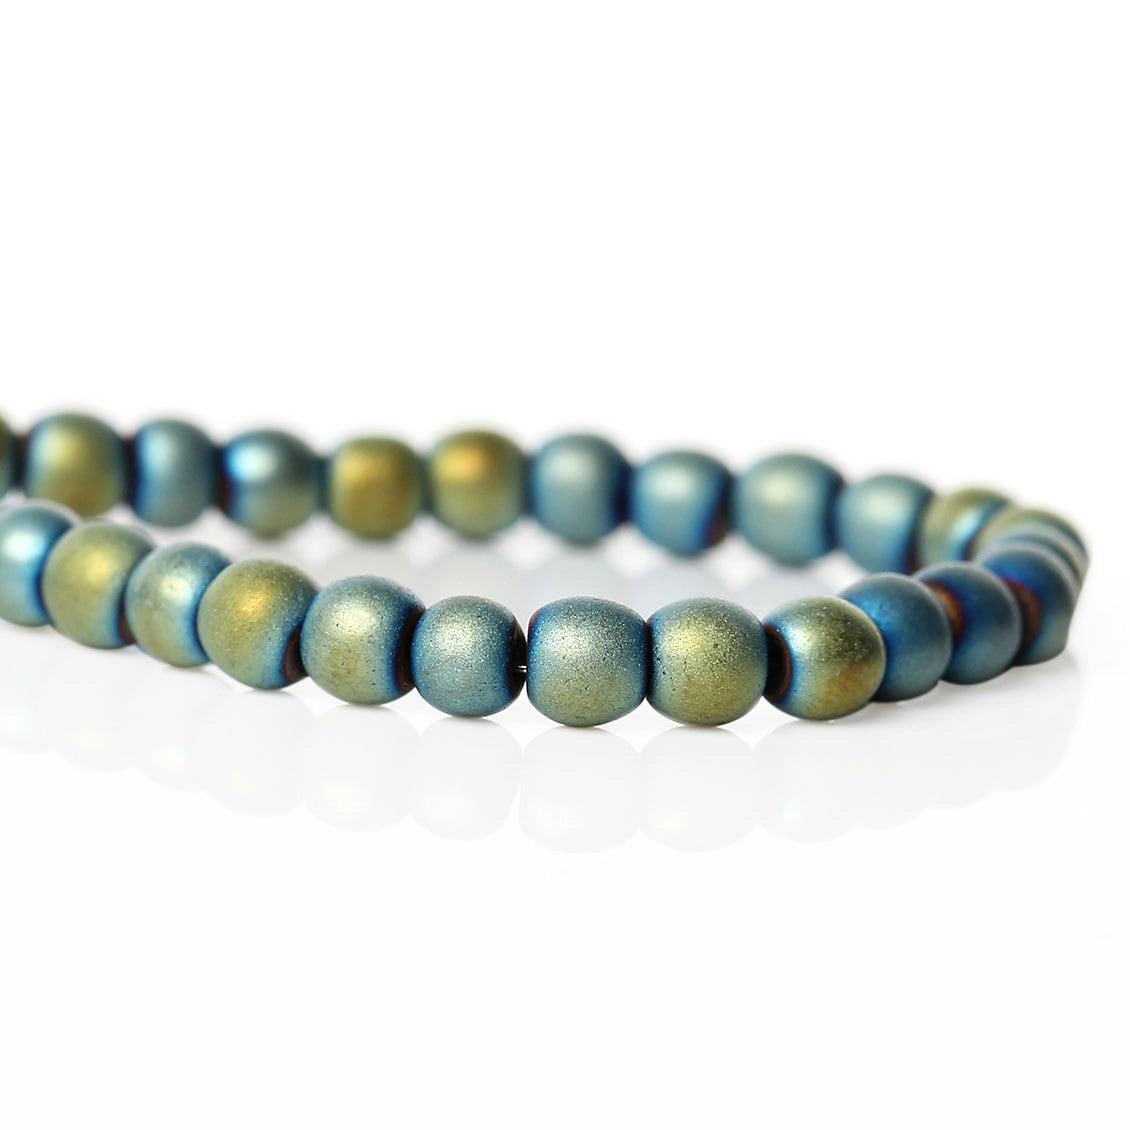 PREMIUM QUALITY DISC RONDELLE HEMATITE BEADS 6mm 145 Bead ...  |Hematite Beads